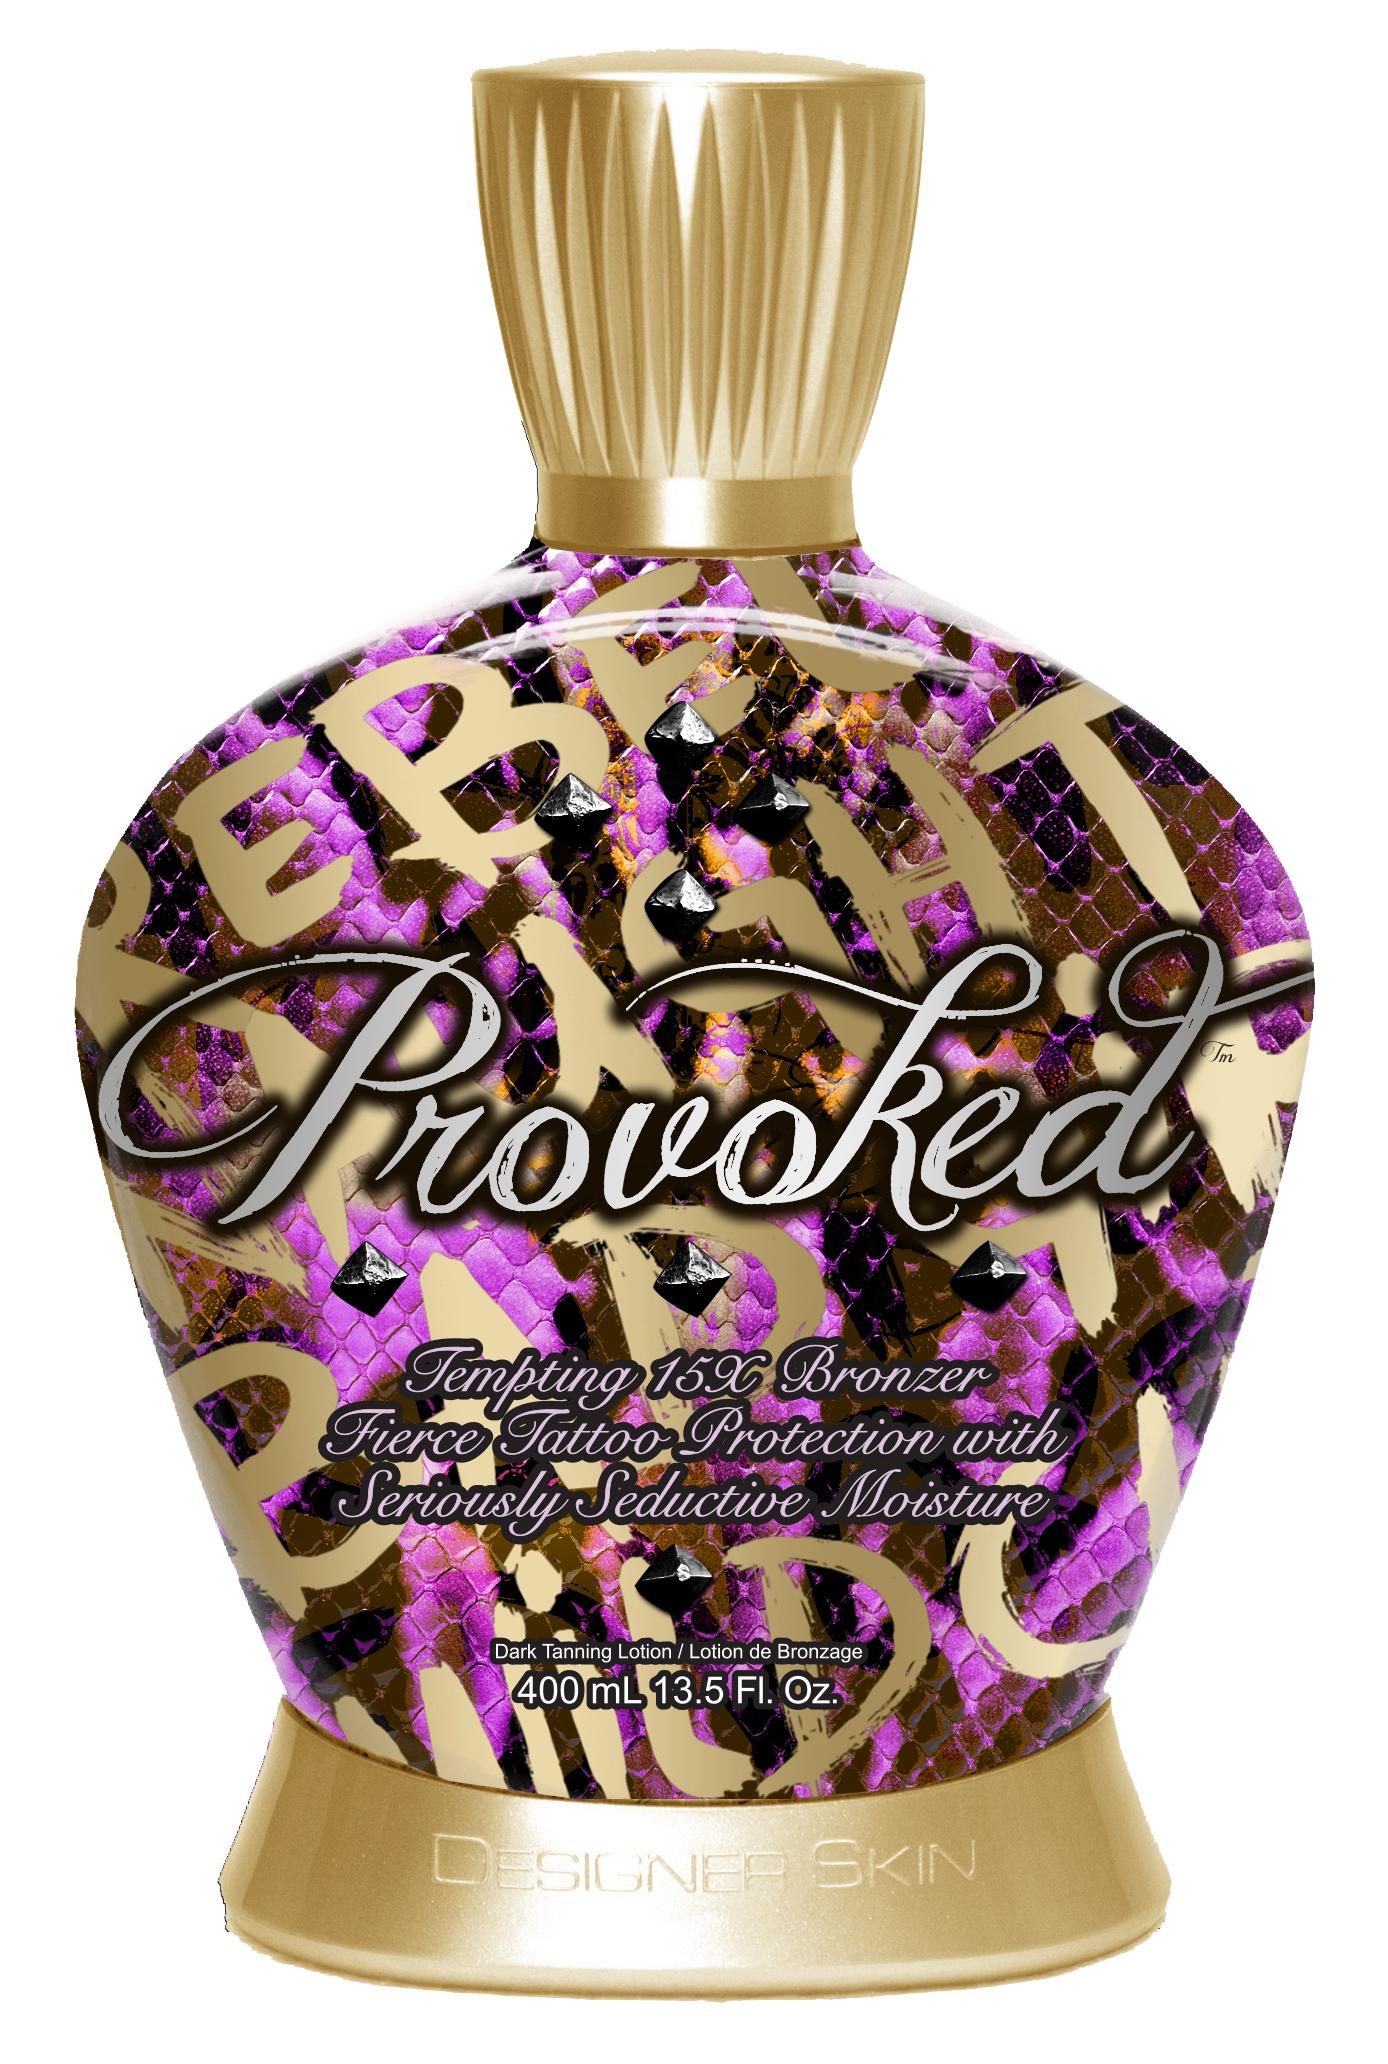 Provoked™ Tempting 15X Bronzer